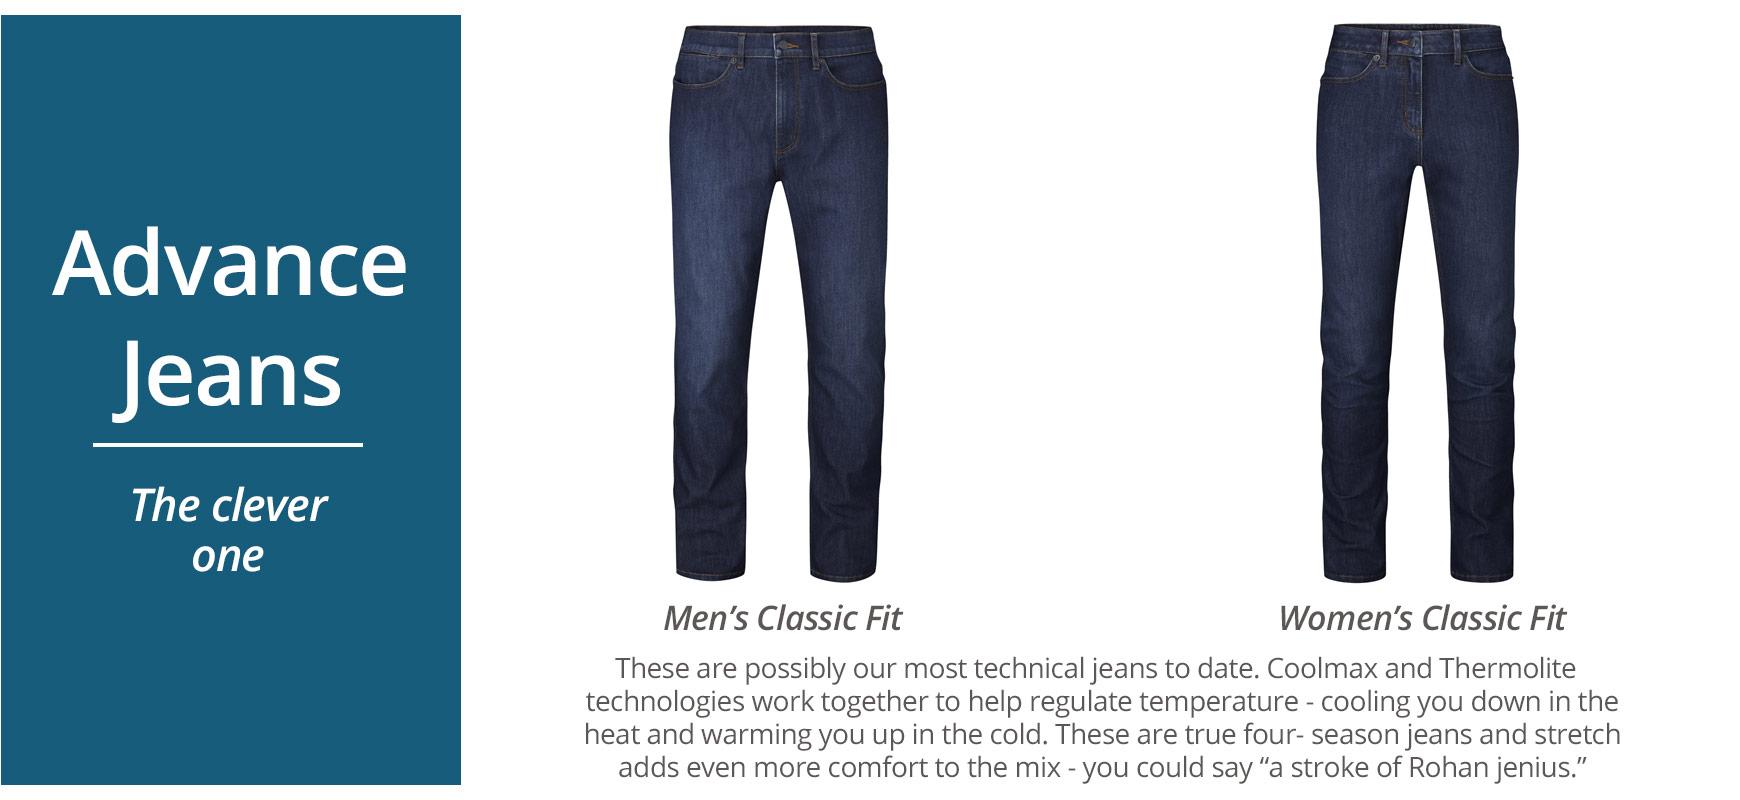 Advance Jeans